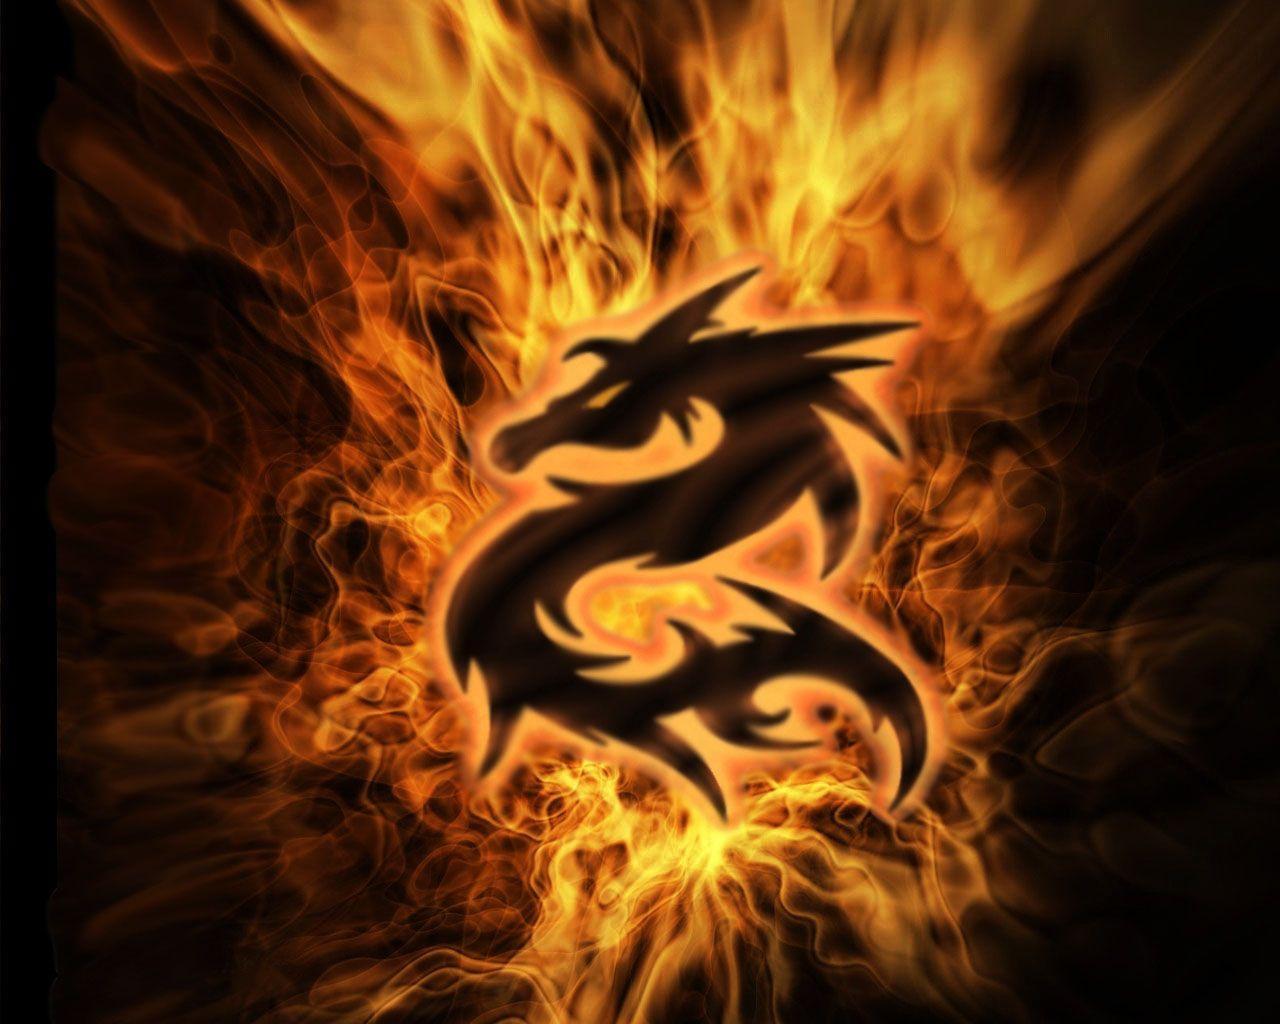 Dragon Screensavers And Wallpapers 1280x1024